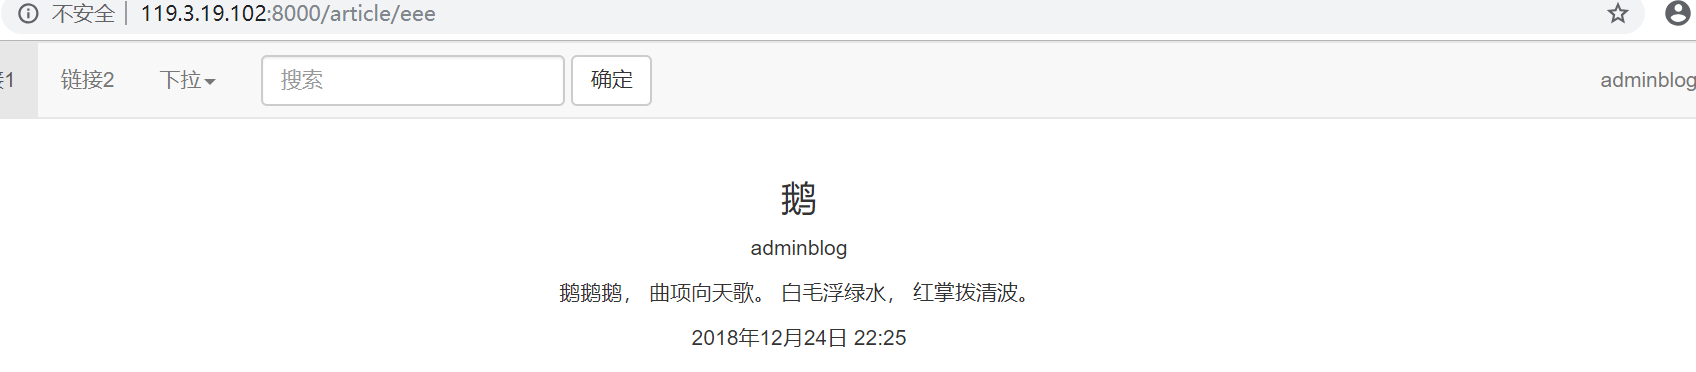 jerrycoding Django建站历程:(九)发布我的第一篇博客